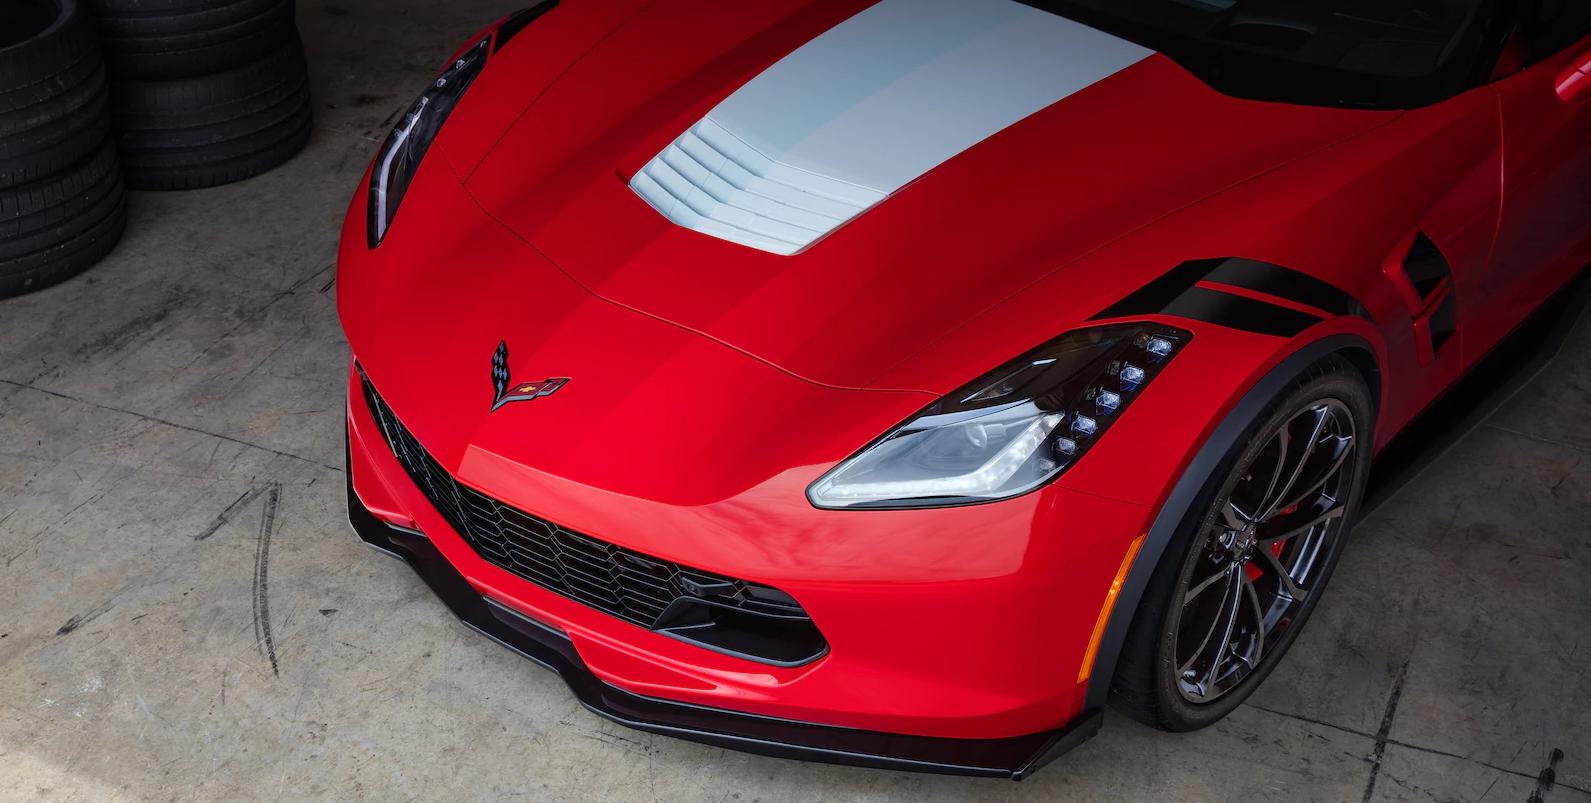 Ny Car Show >> 2019 Chevrolet Corvette Grand Sport Overview - The News Wheel